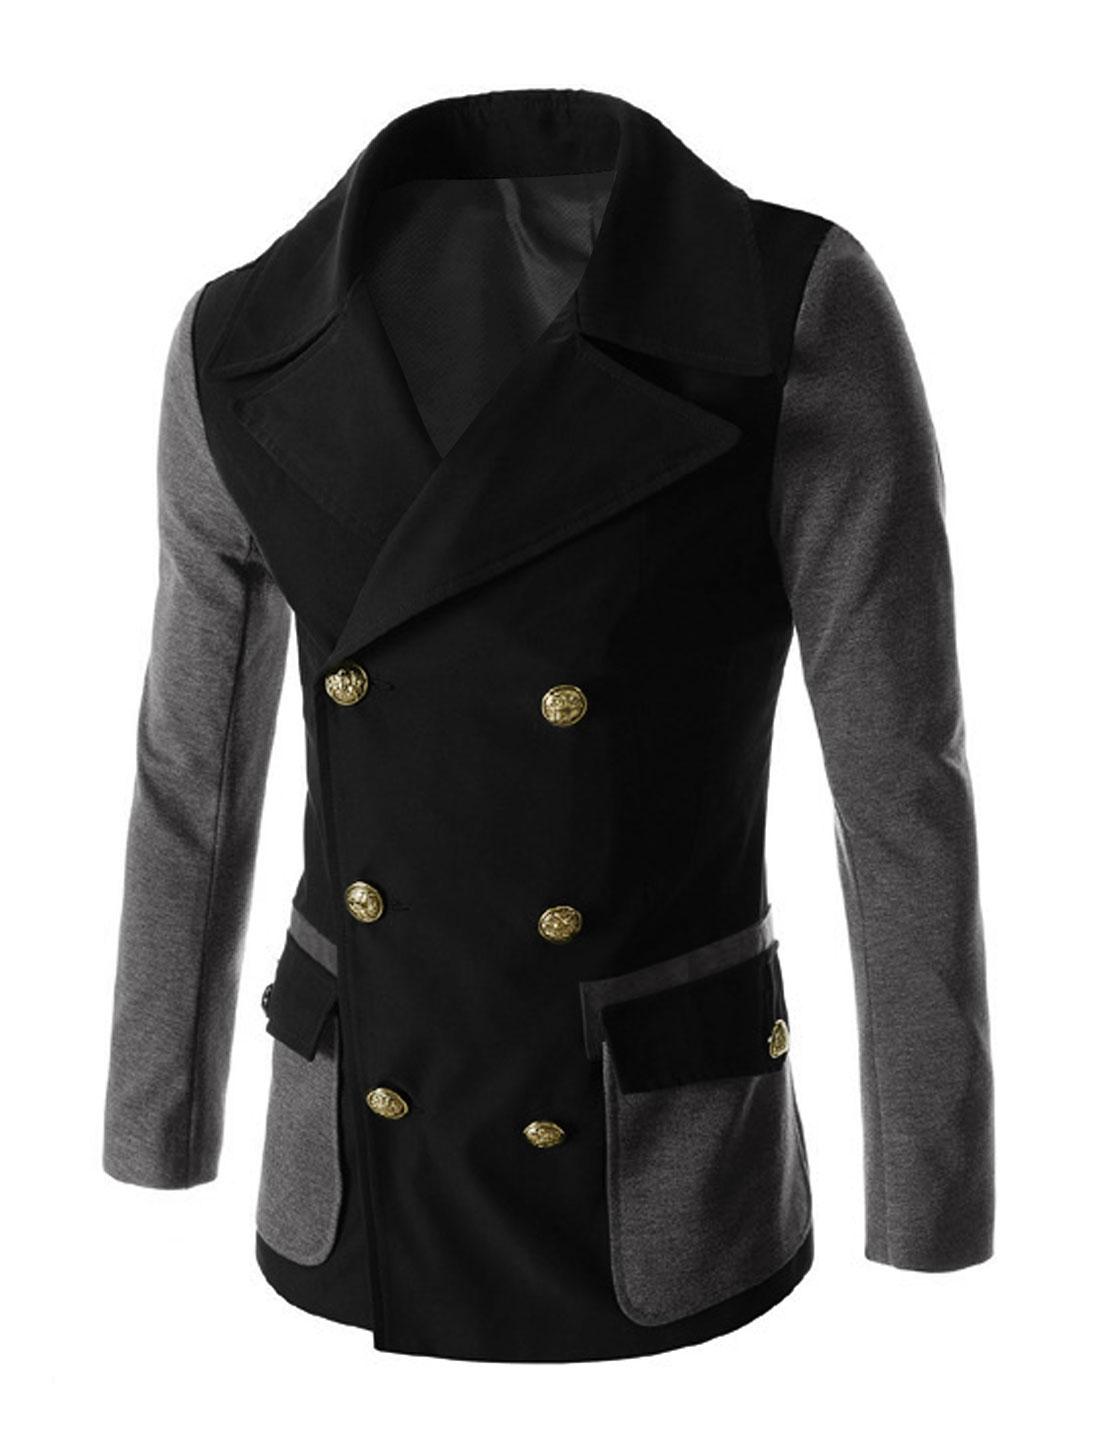 Men Long Sleeve Double Breasted Flap Pockets Split Back Casual Jacket Black M